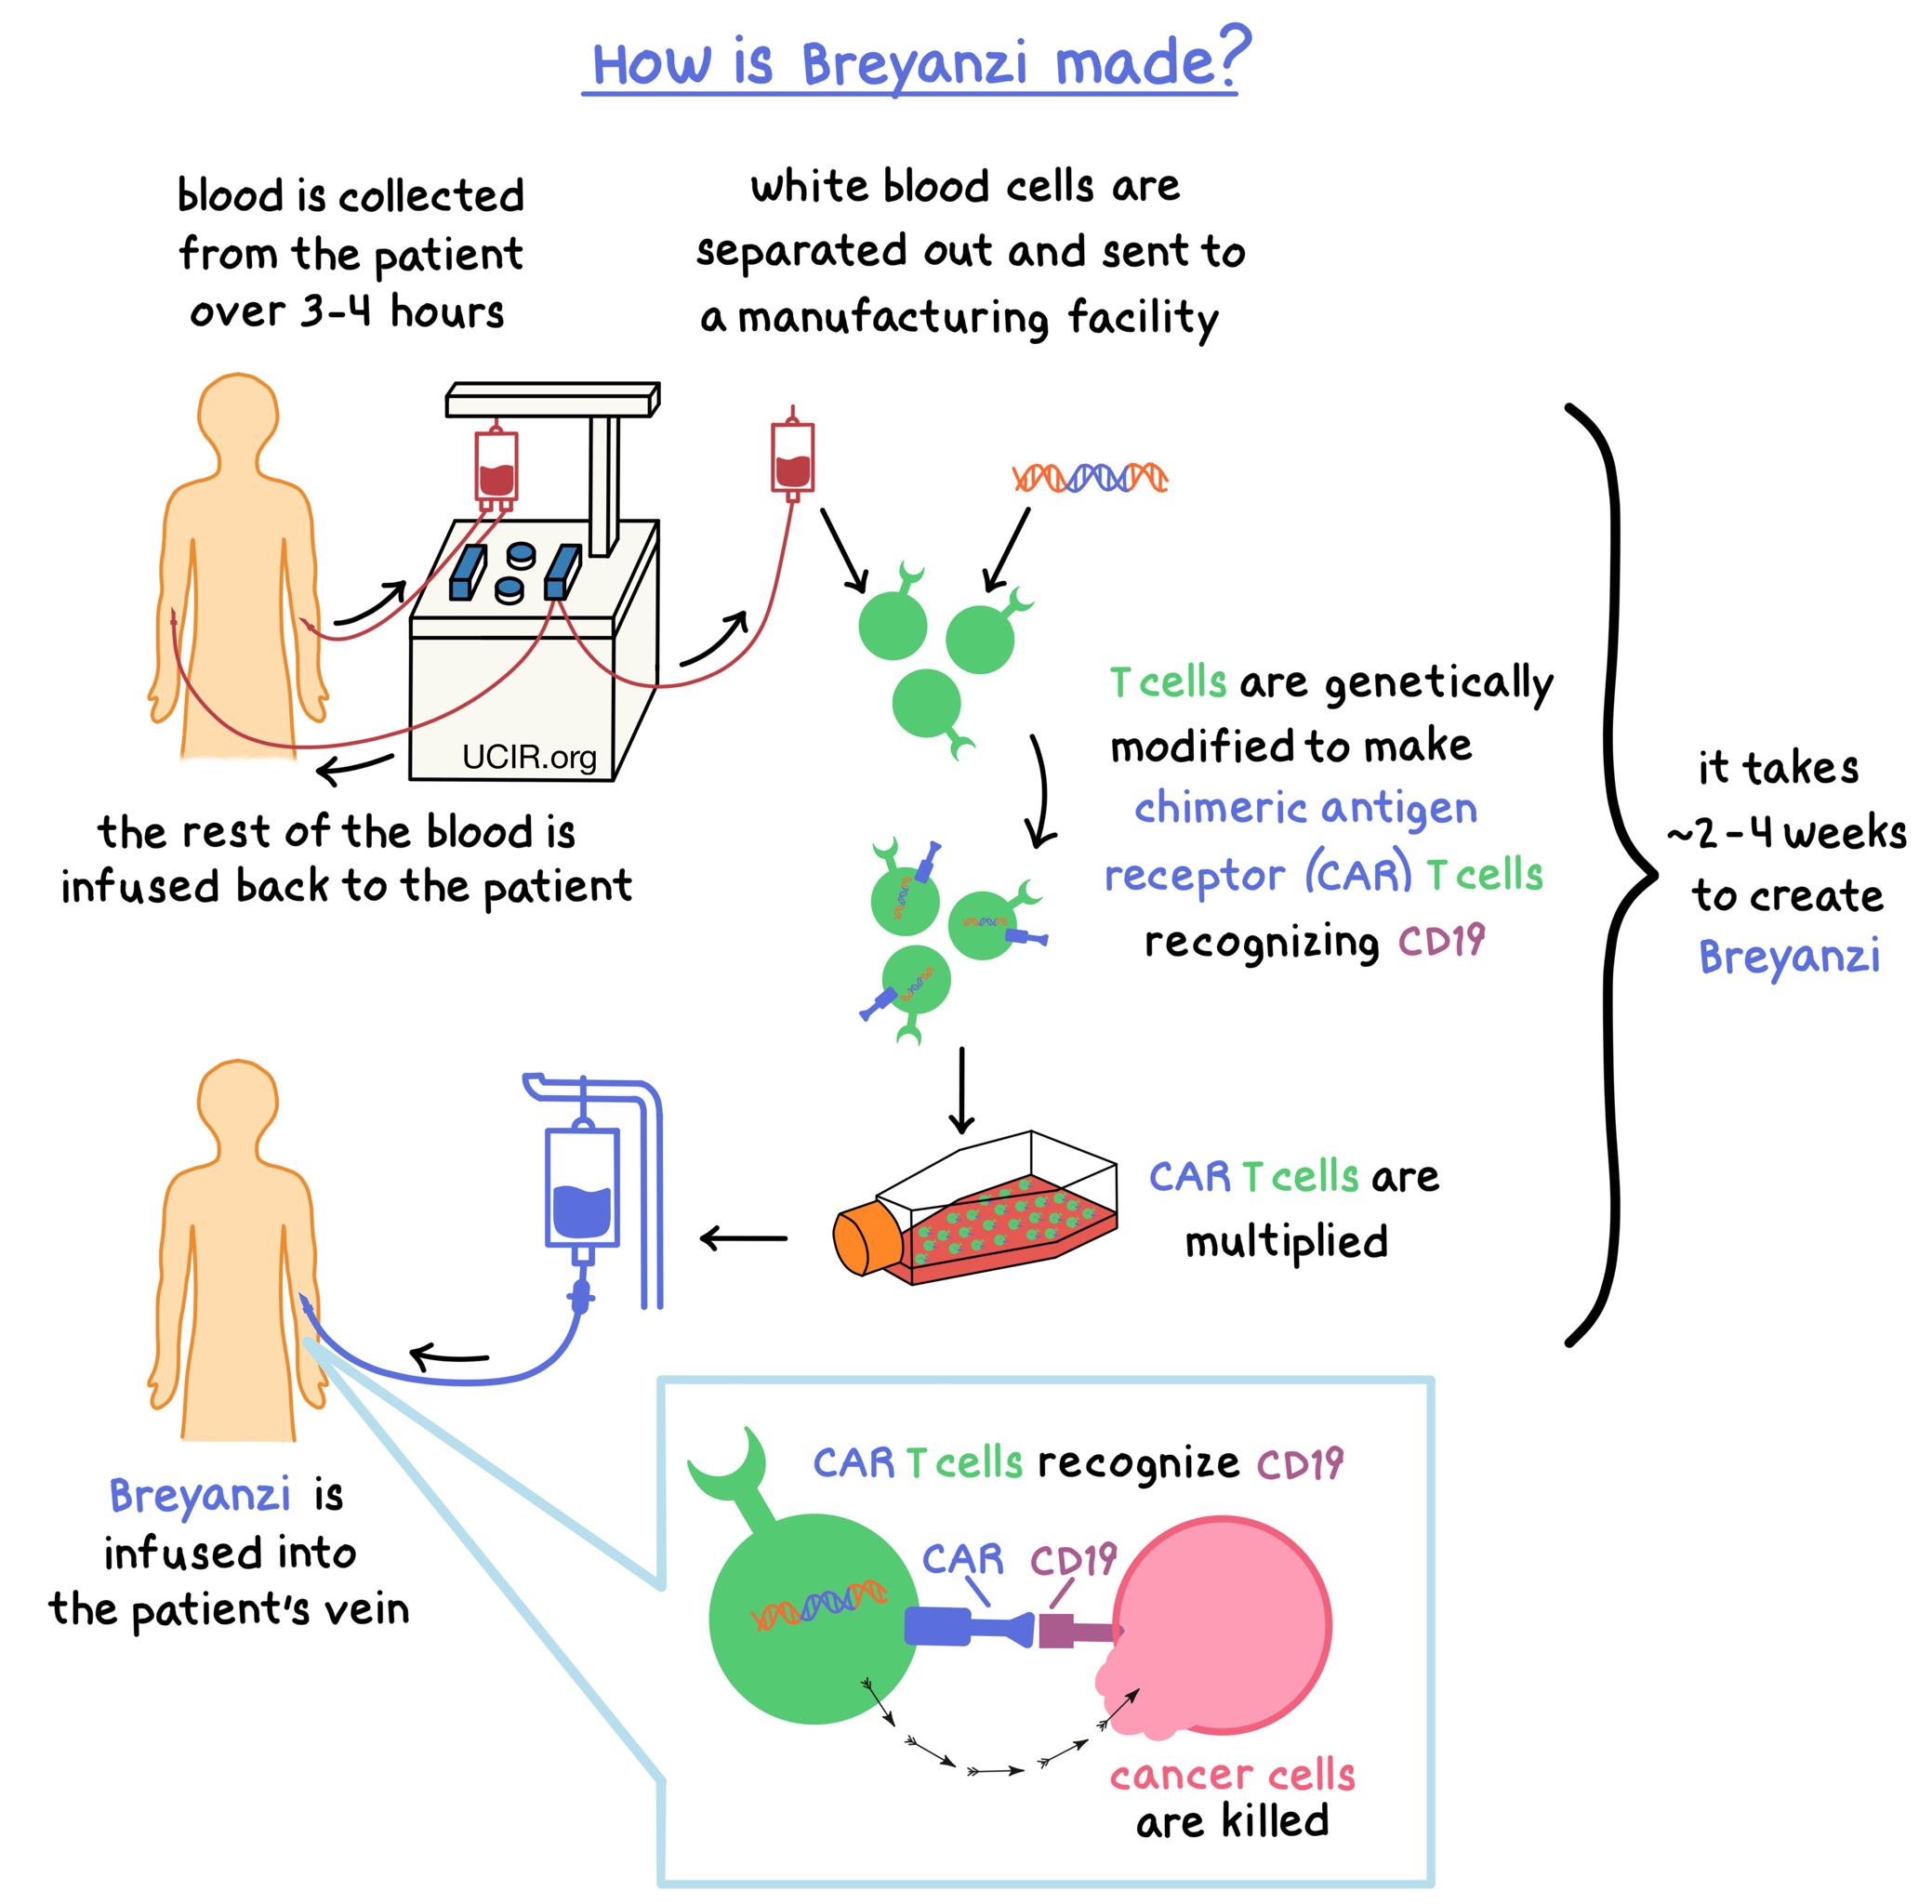 Illustration showing how Breyanzi is made